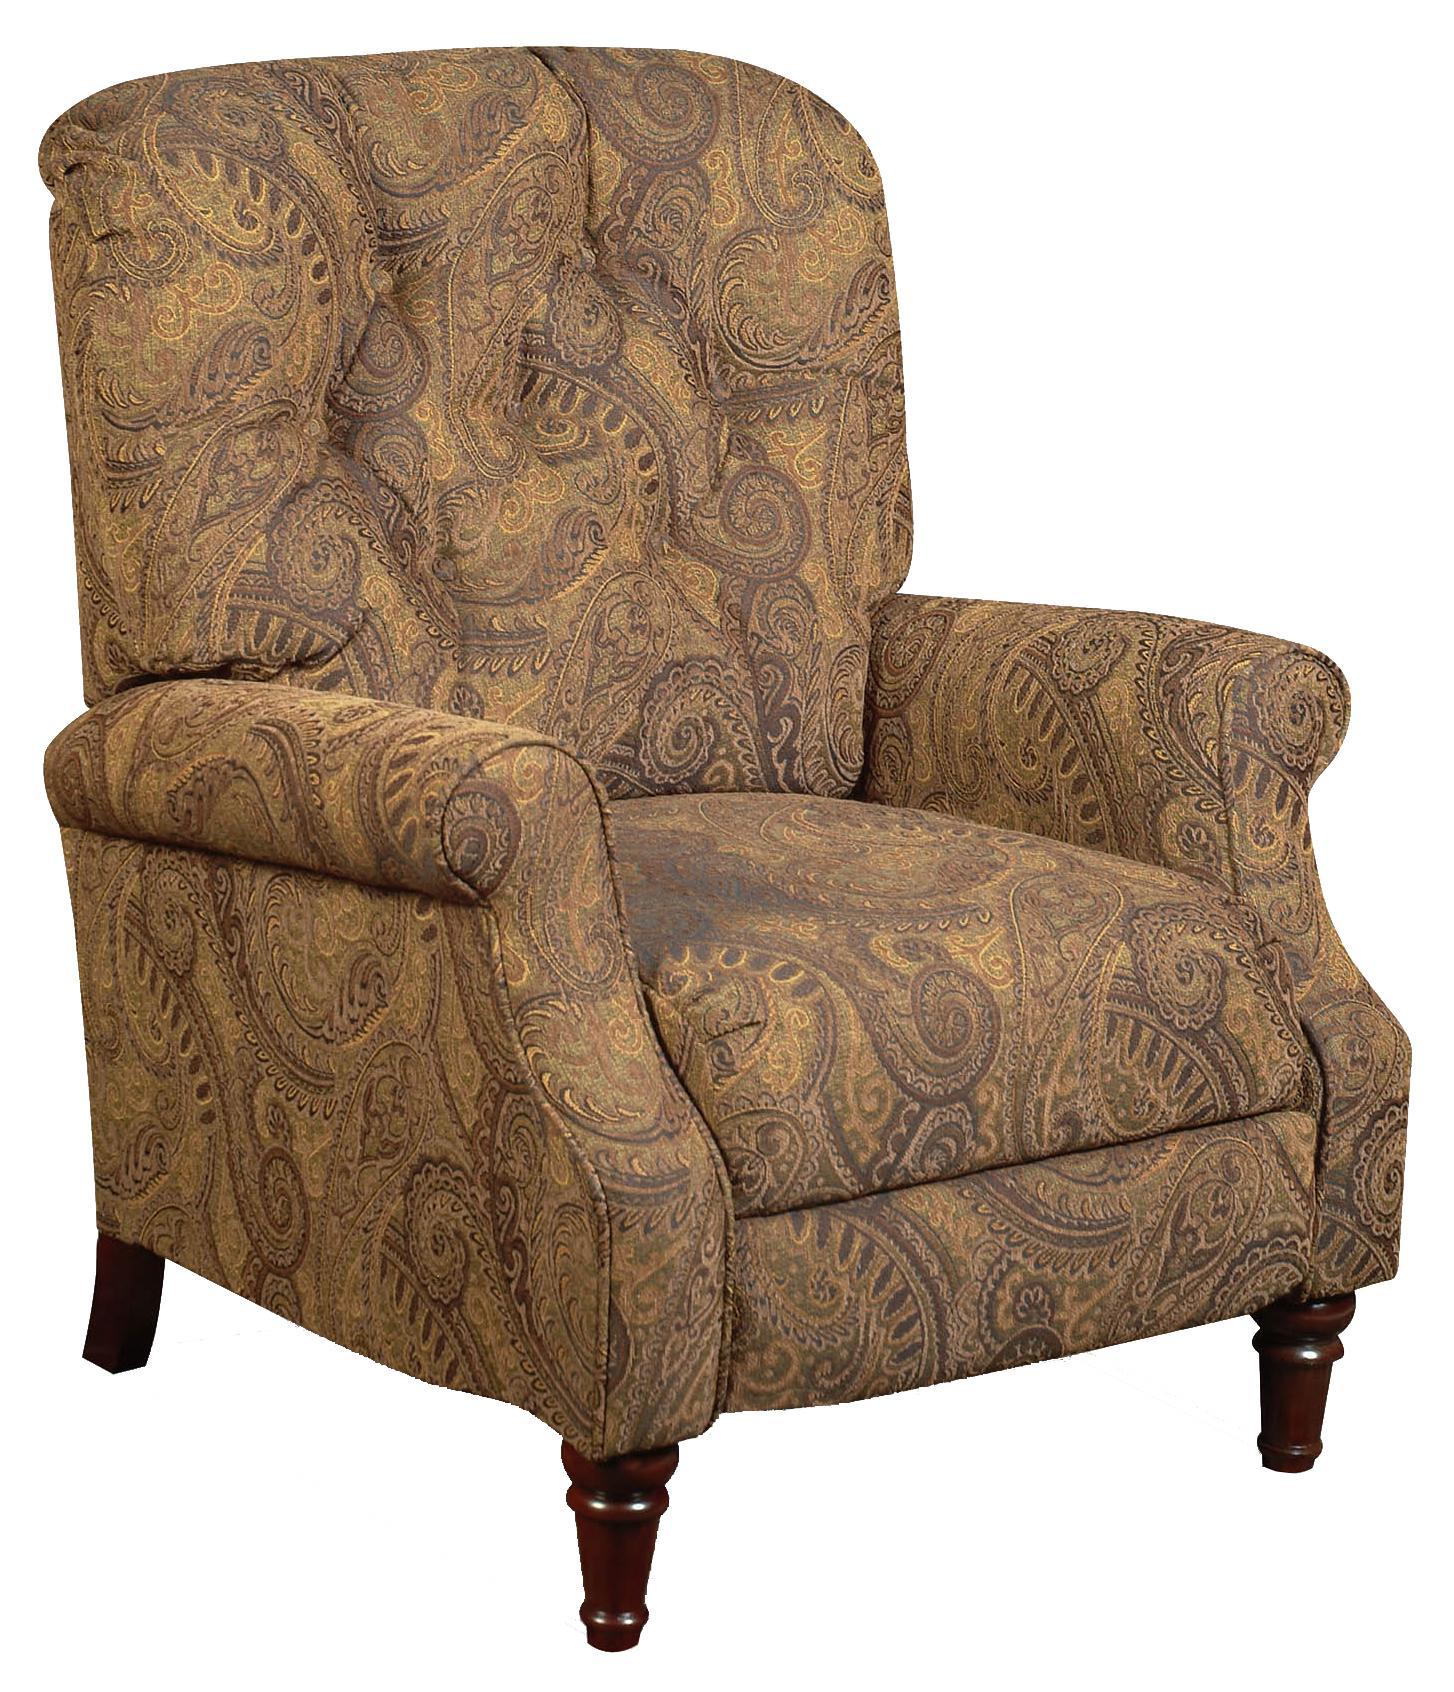 American Furniture Recliners  2650 Recliner - Item Number: 2650 6370